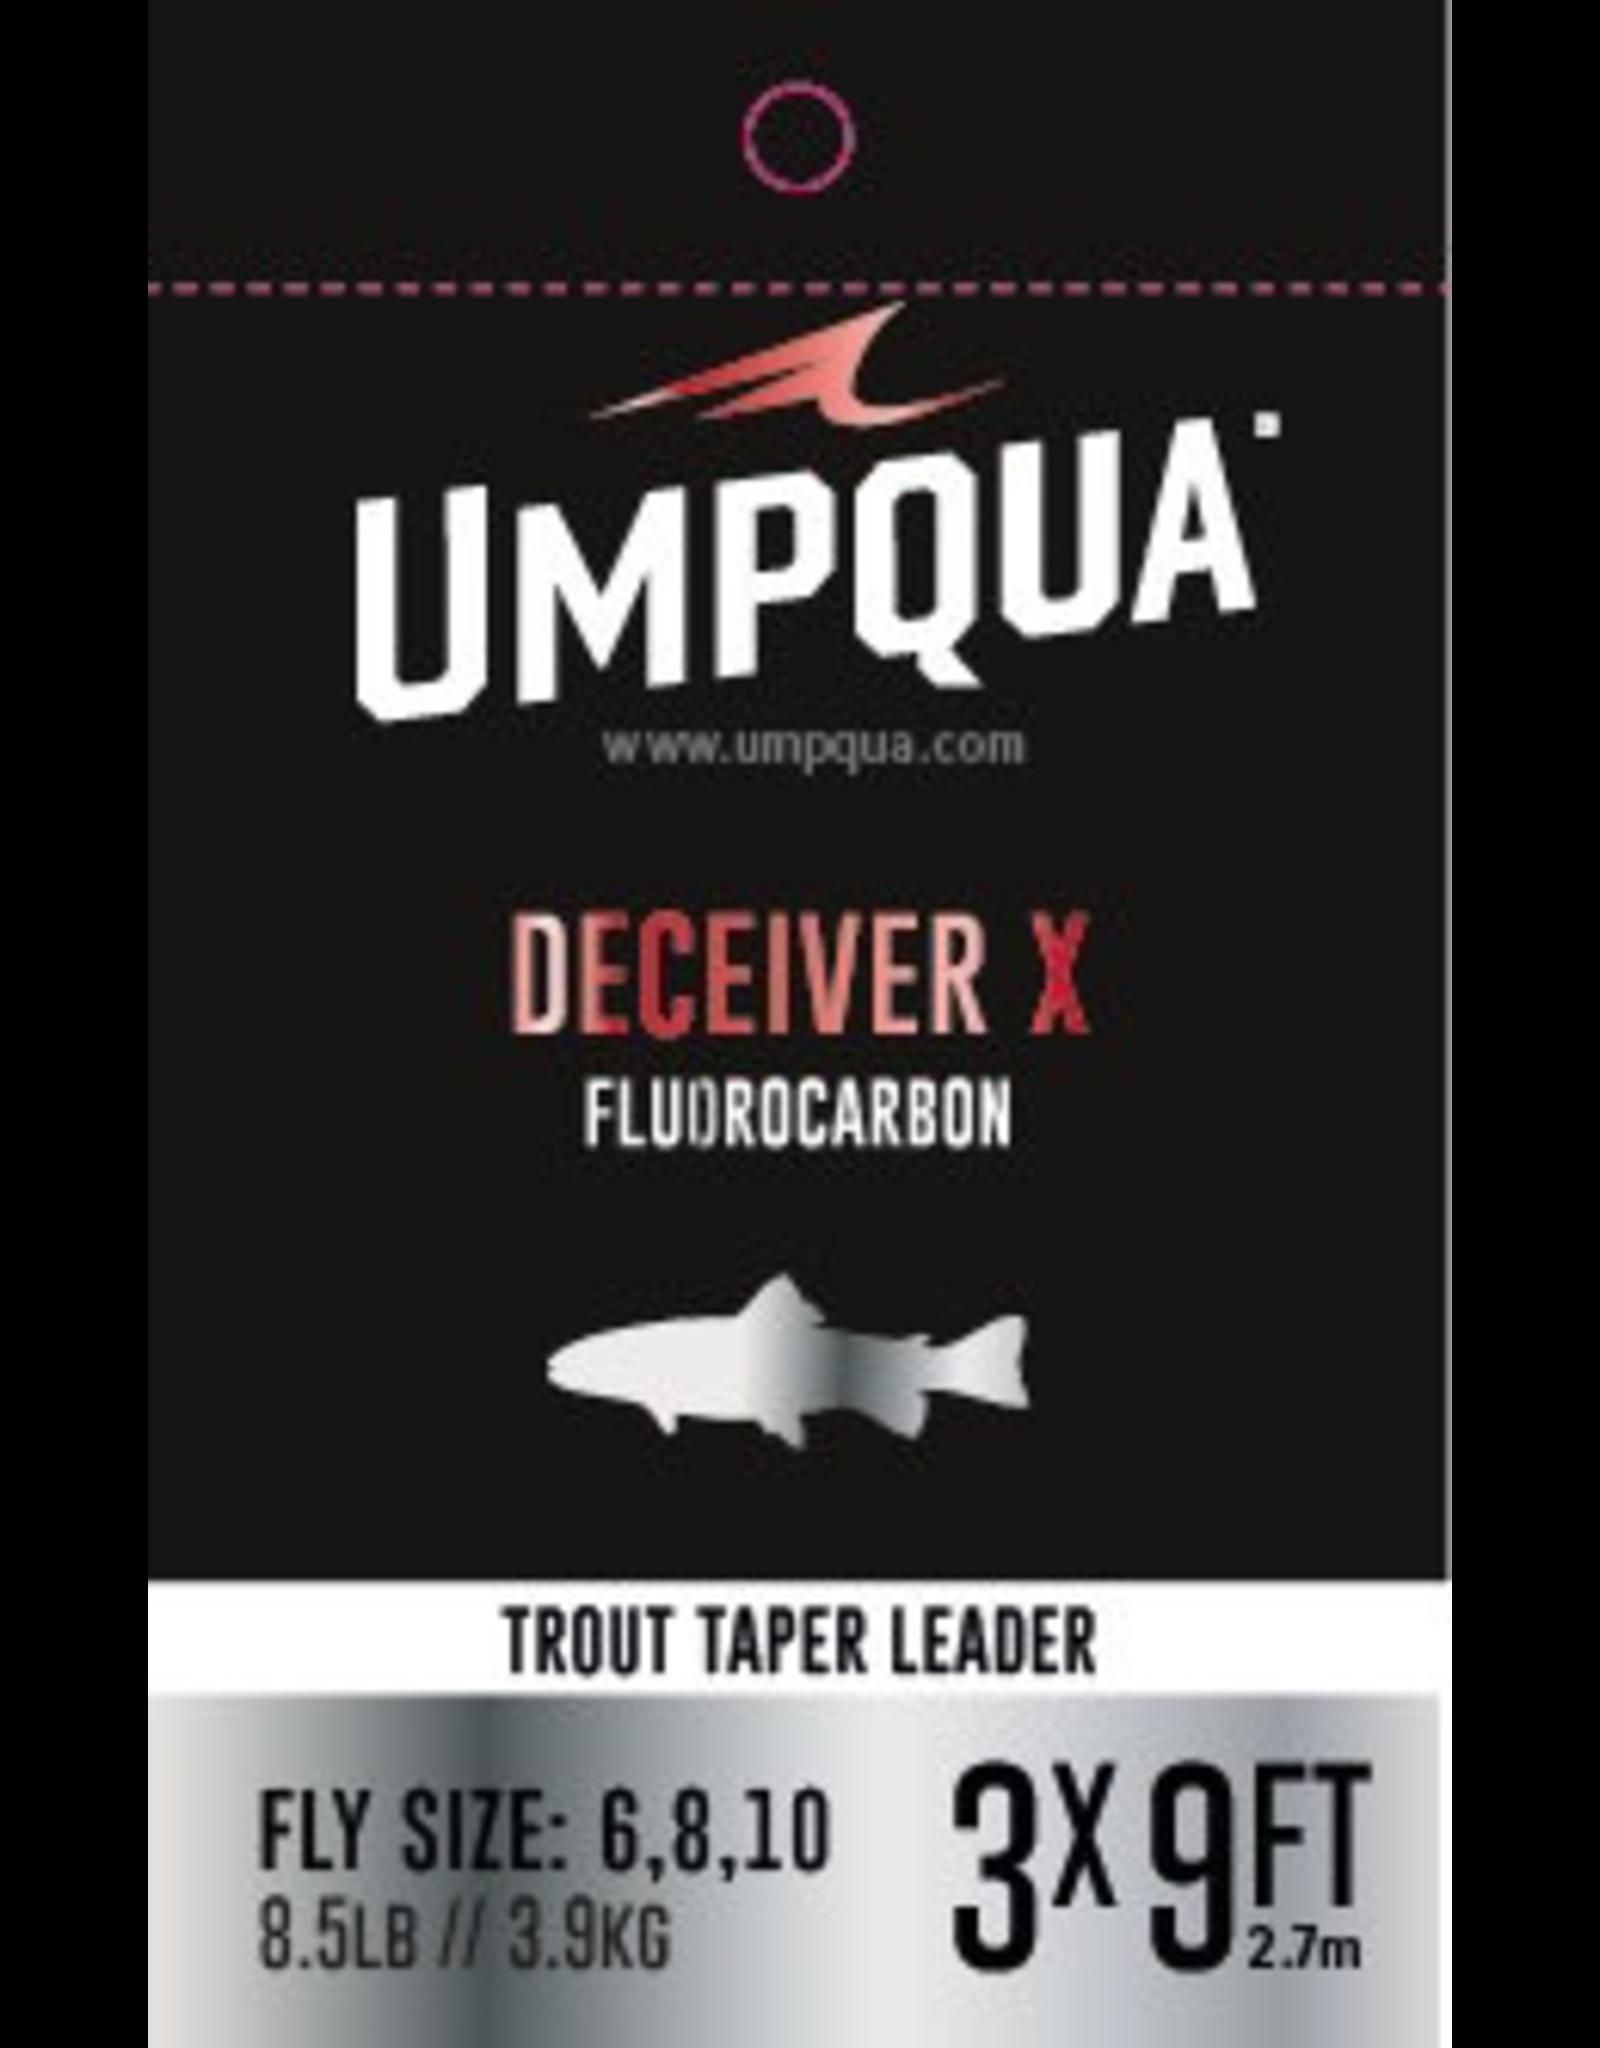 The finest premium fluorocarbon trout leaders Umpqua has ever made.